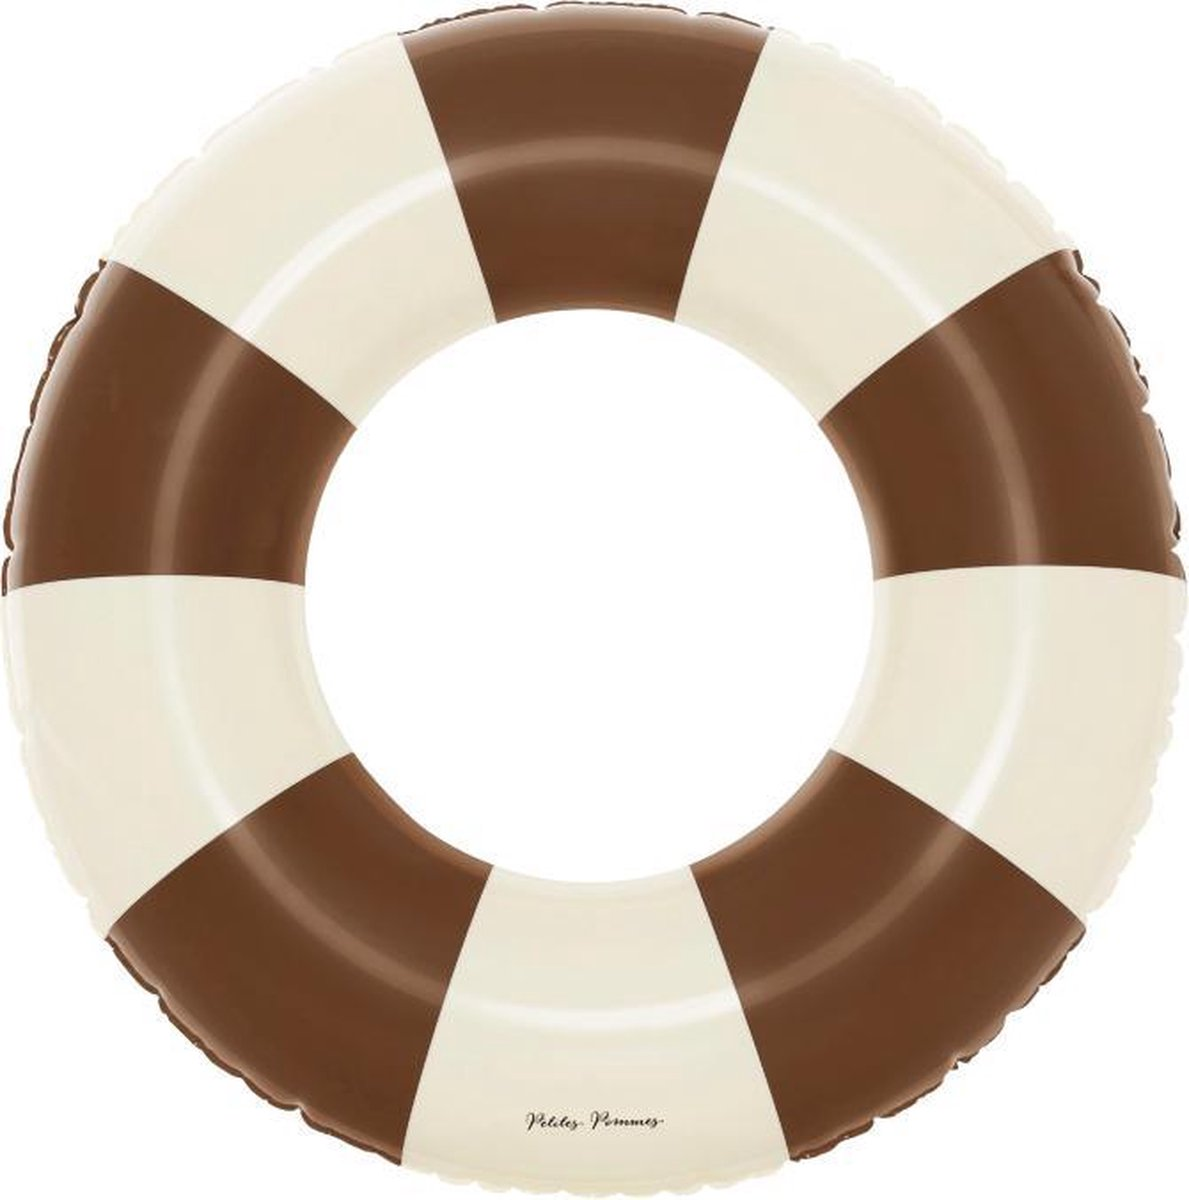 Petites Pommes Zwemring Olivia Charleston Tan - Zwemband - 45 cm - 1 tot 3 jaar